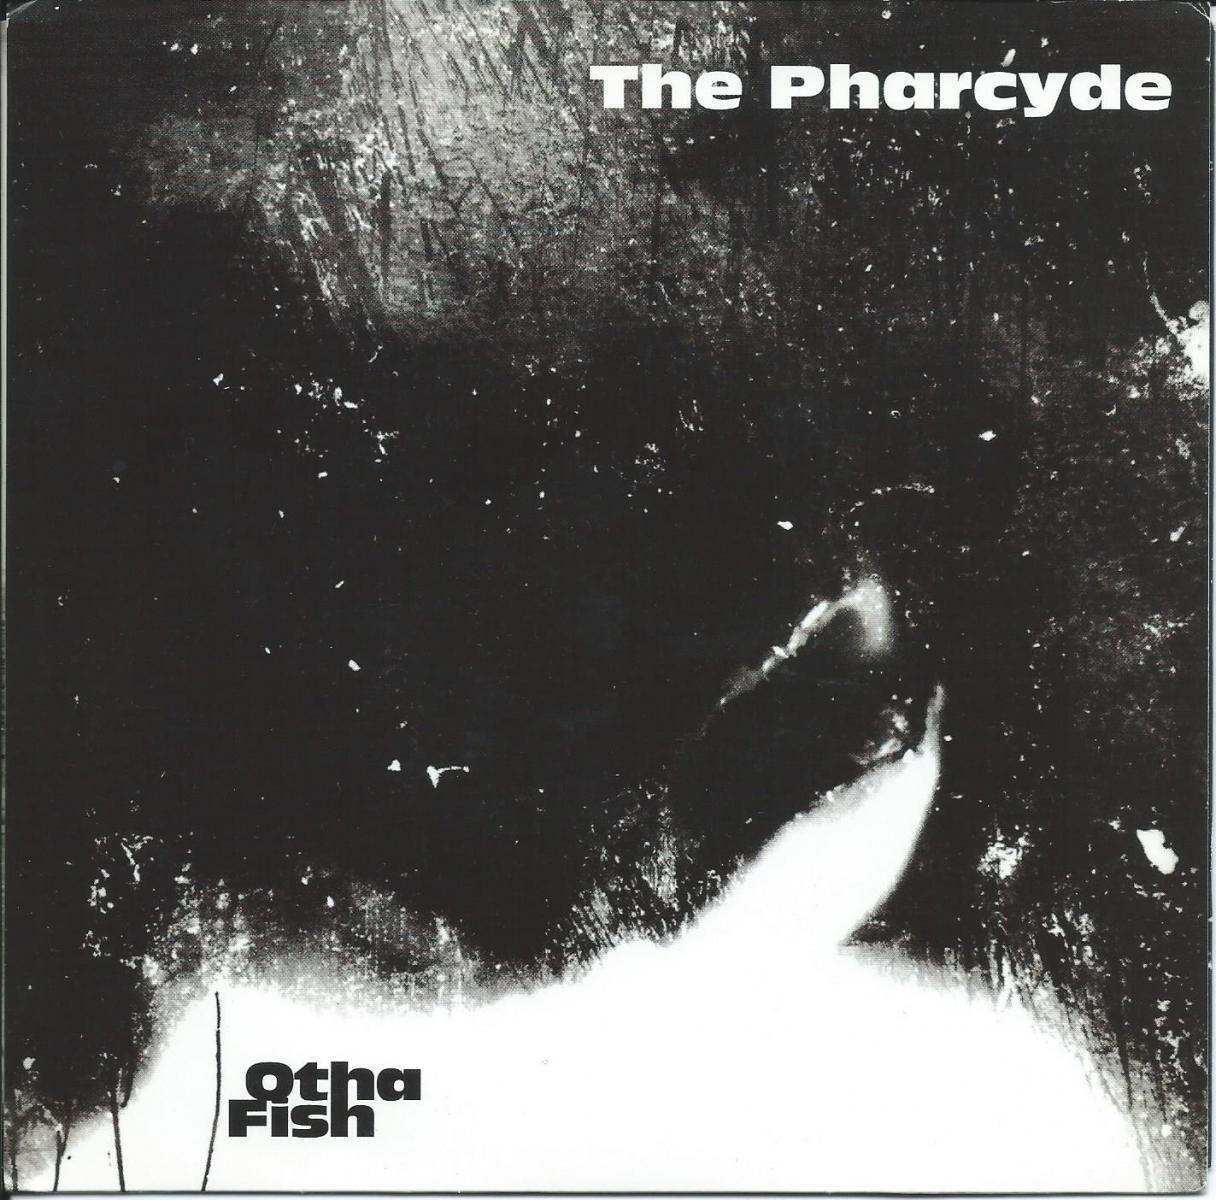 THE PHARCYDE / OTHA FISH / PHARCYDE LIVE AT DODGER STADIUM (7